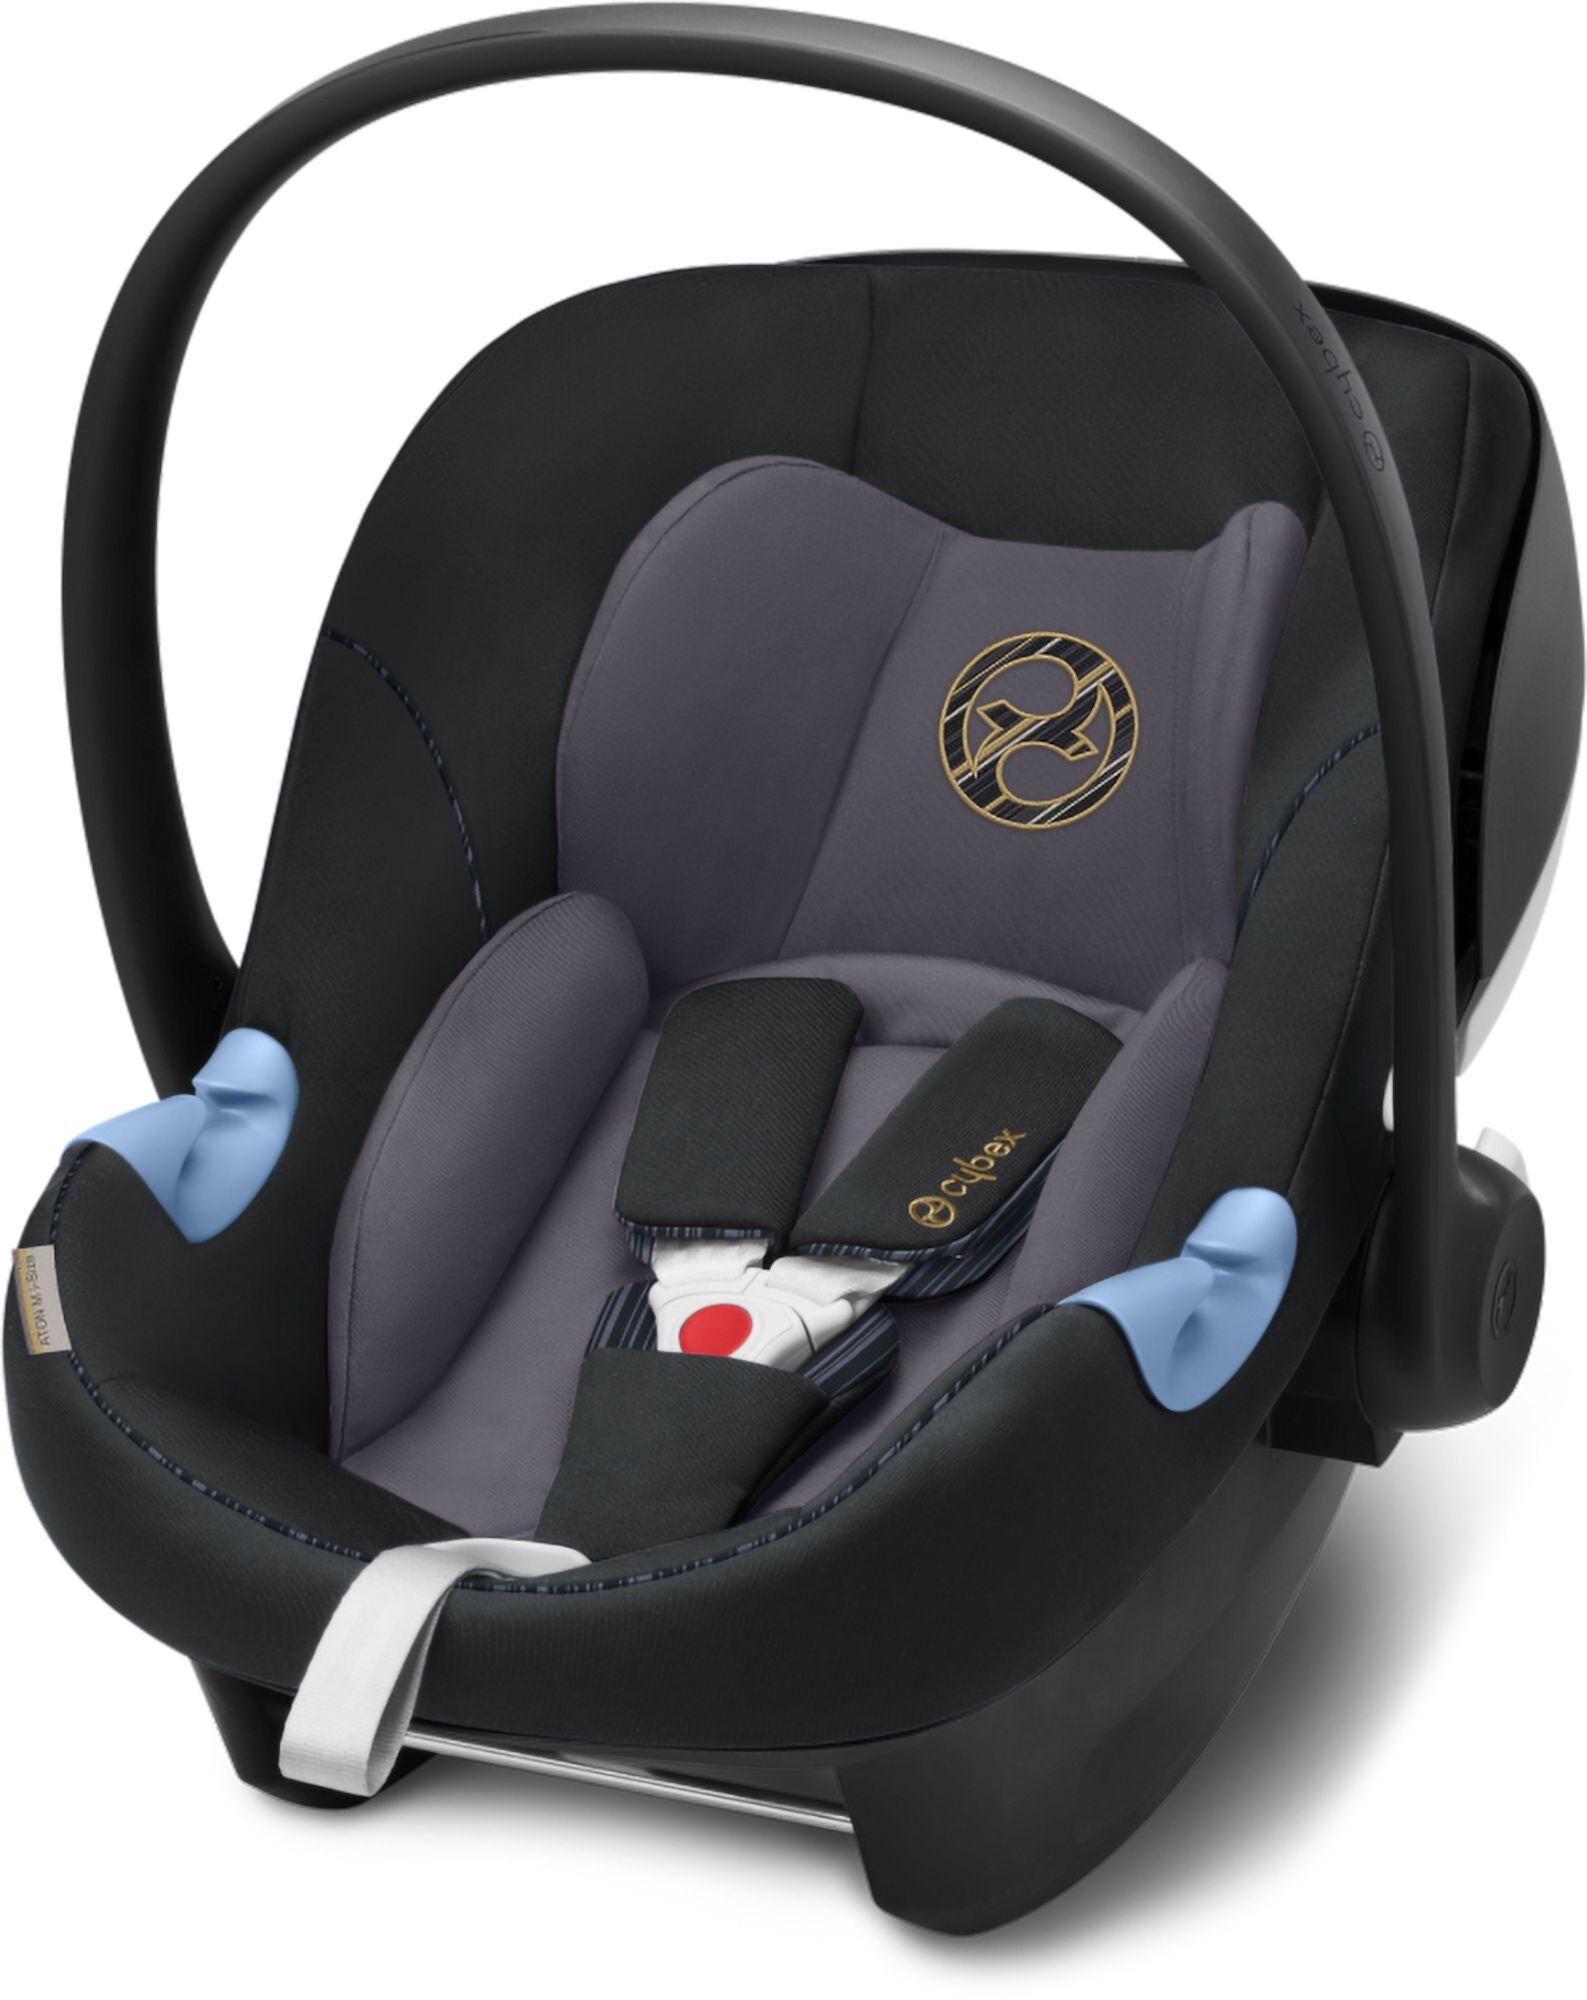 Cybex Aton M i-Size, Premium Black